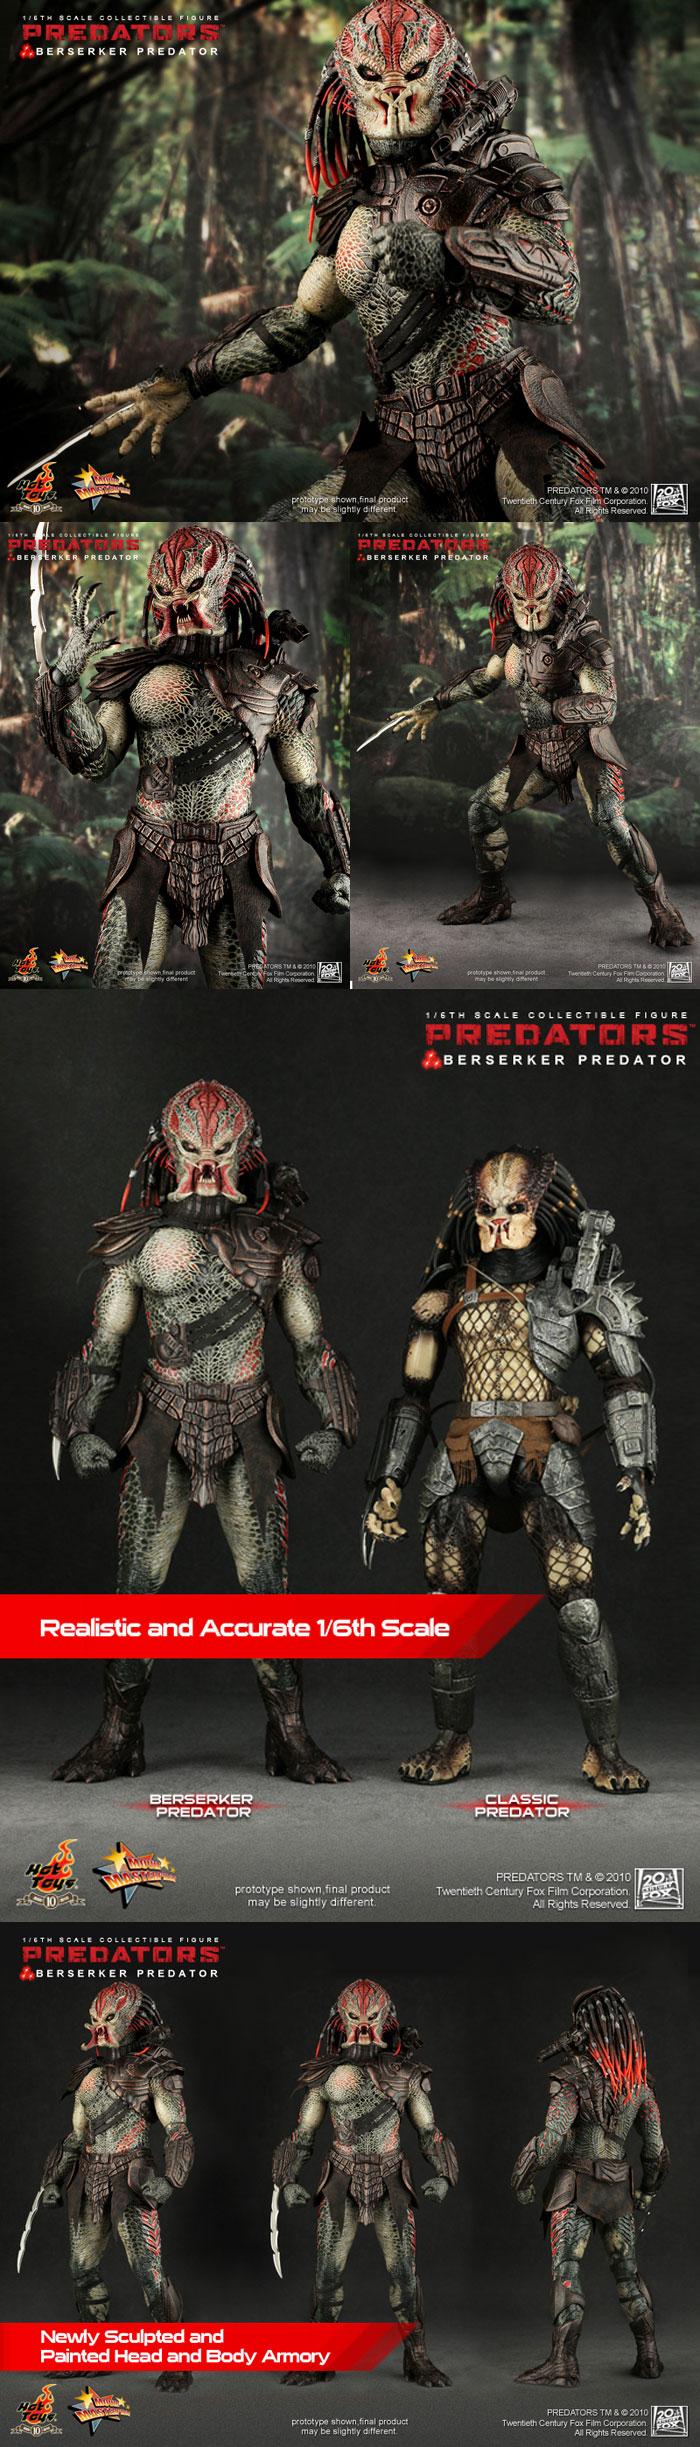 [Predators: 1/6th scale Berserker Predator]